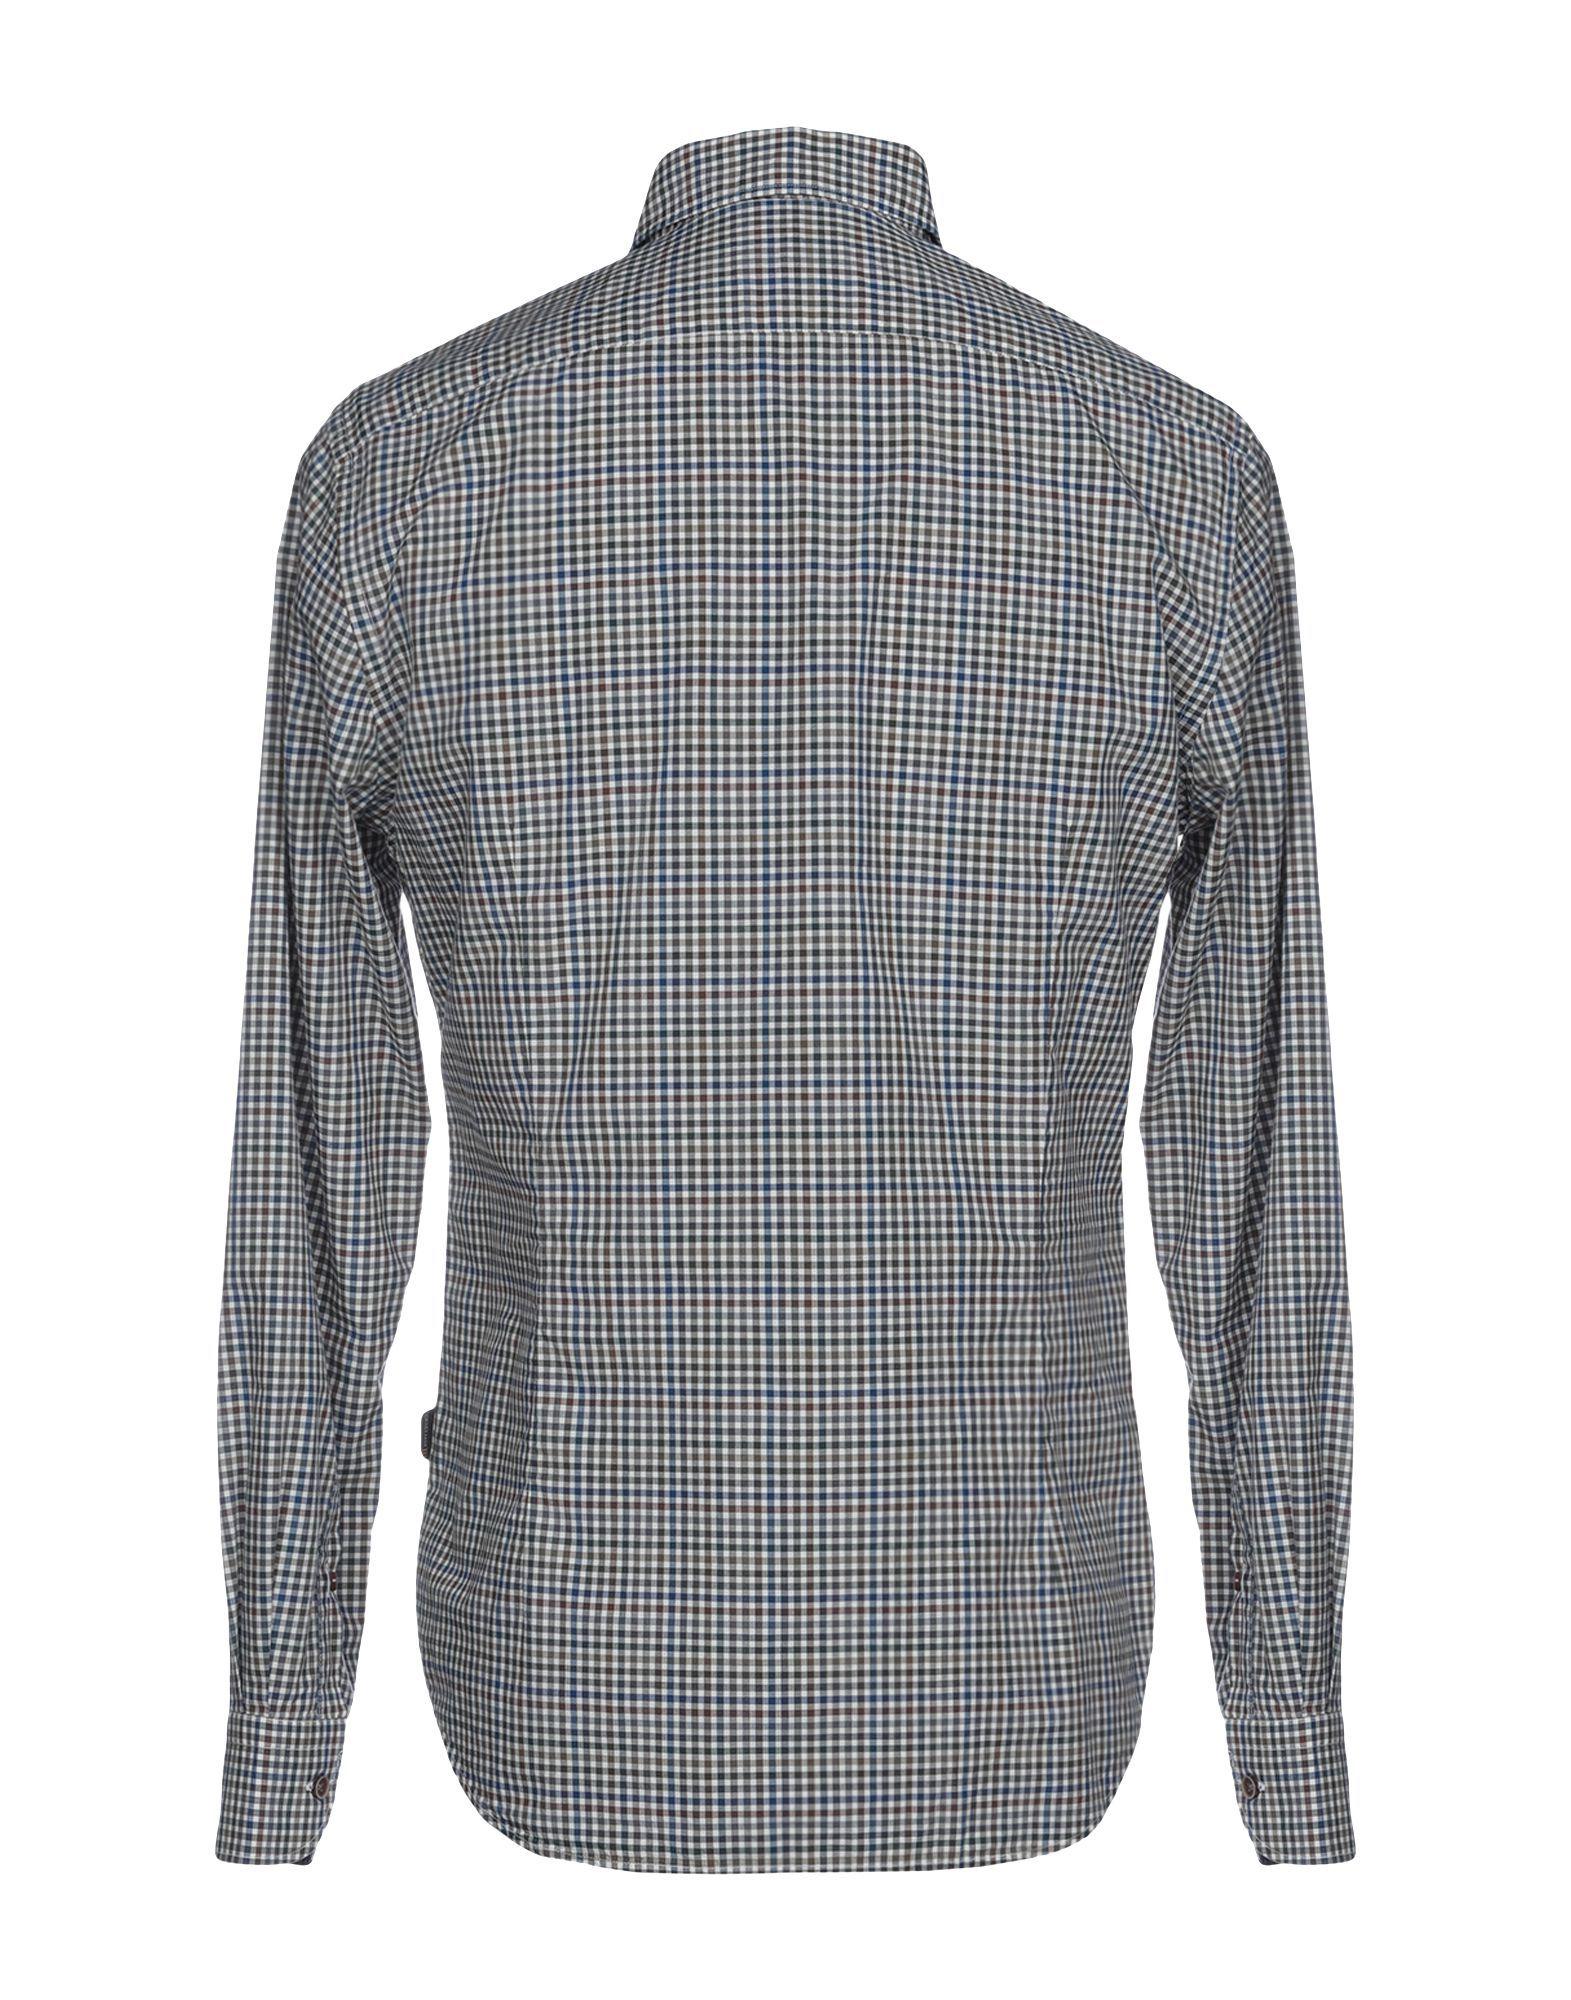 Corneliani Id Blue Check Cotton Shirt